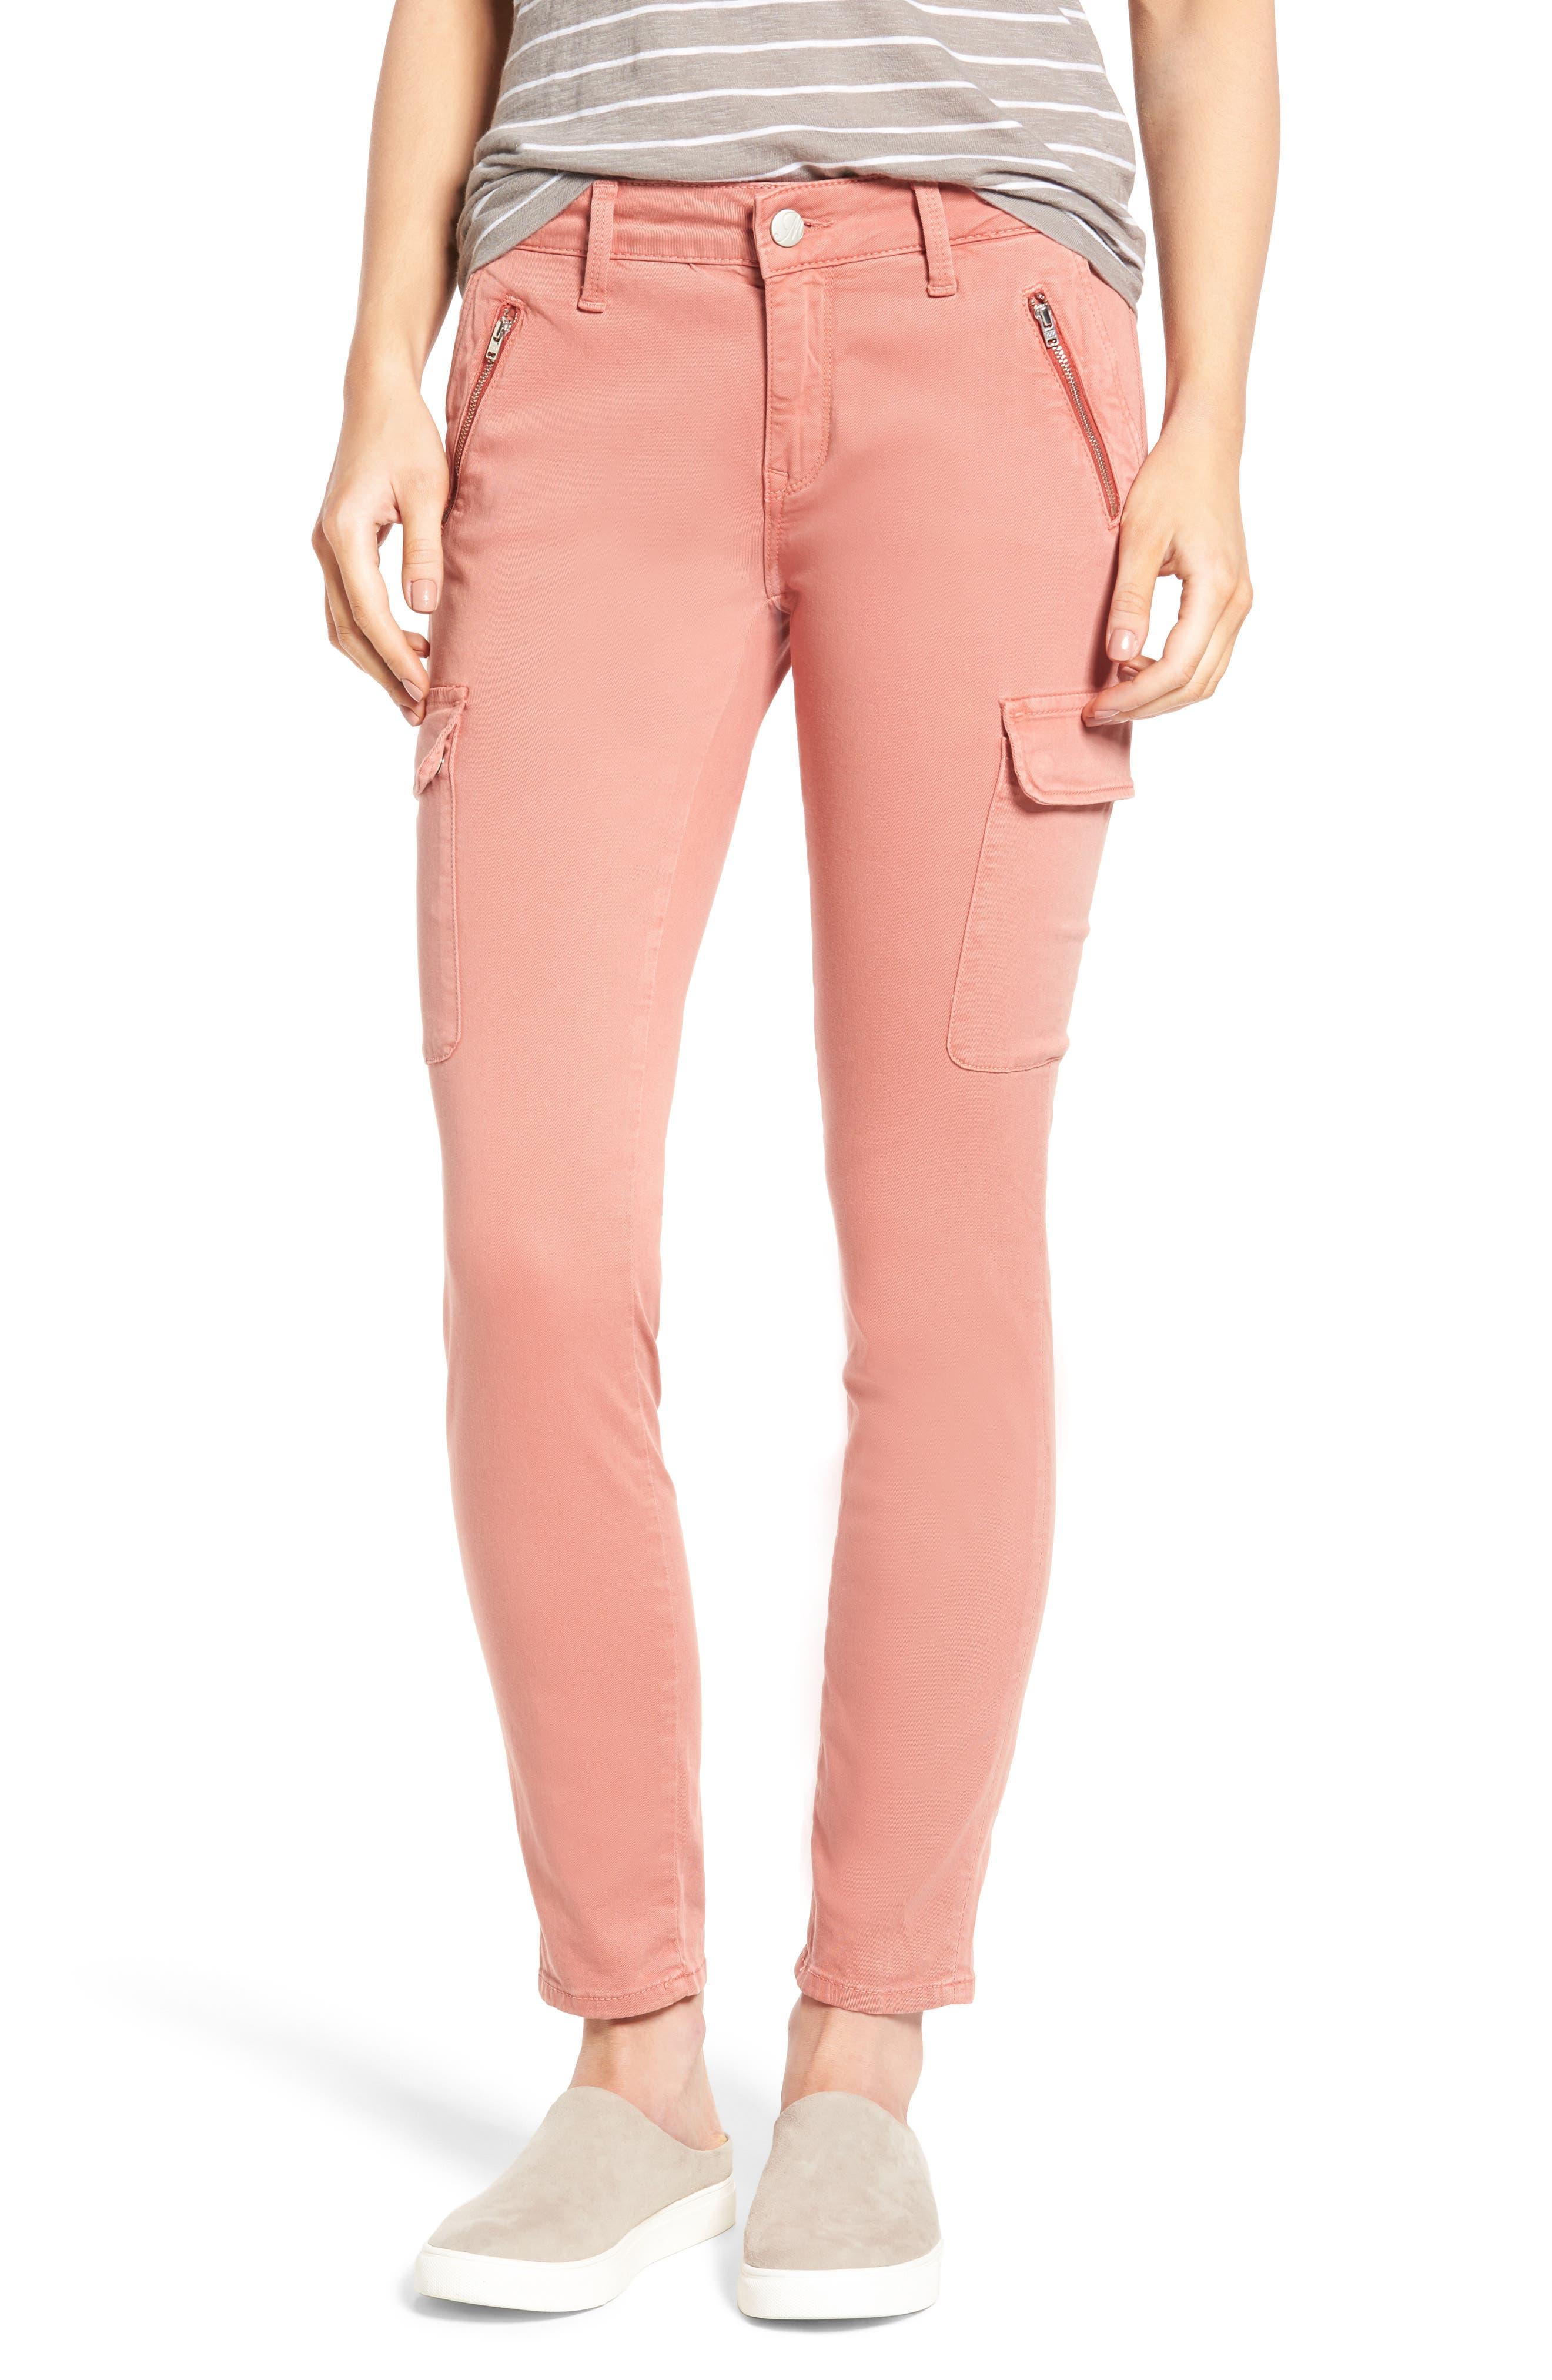 MAVI JEANS Juliette Cargo Pants